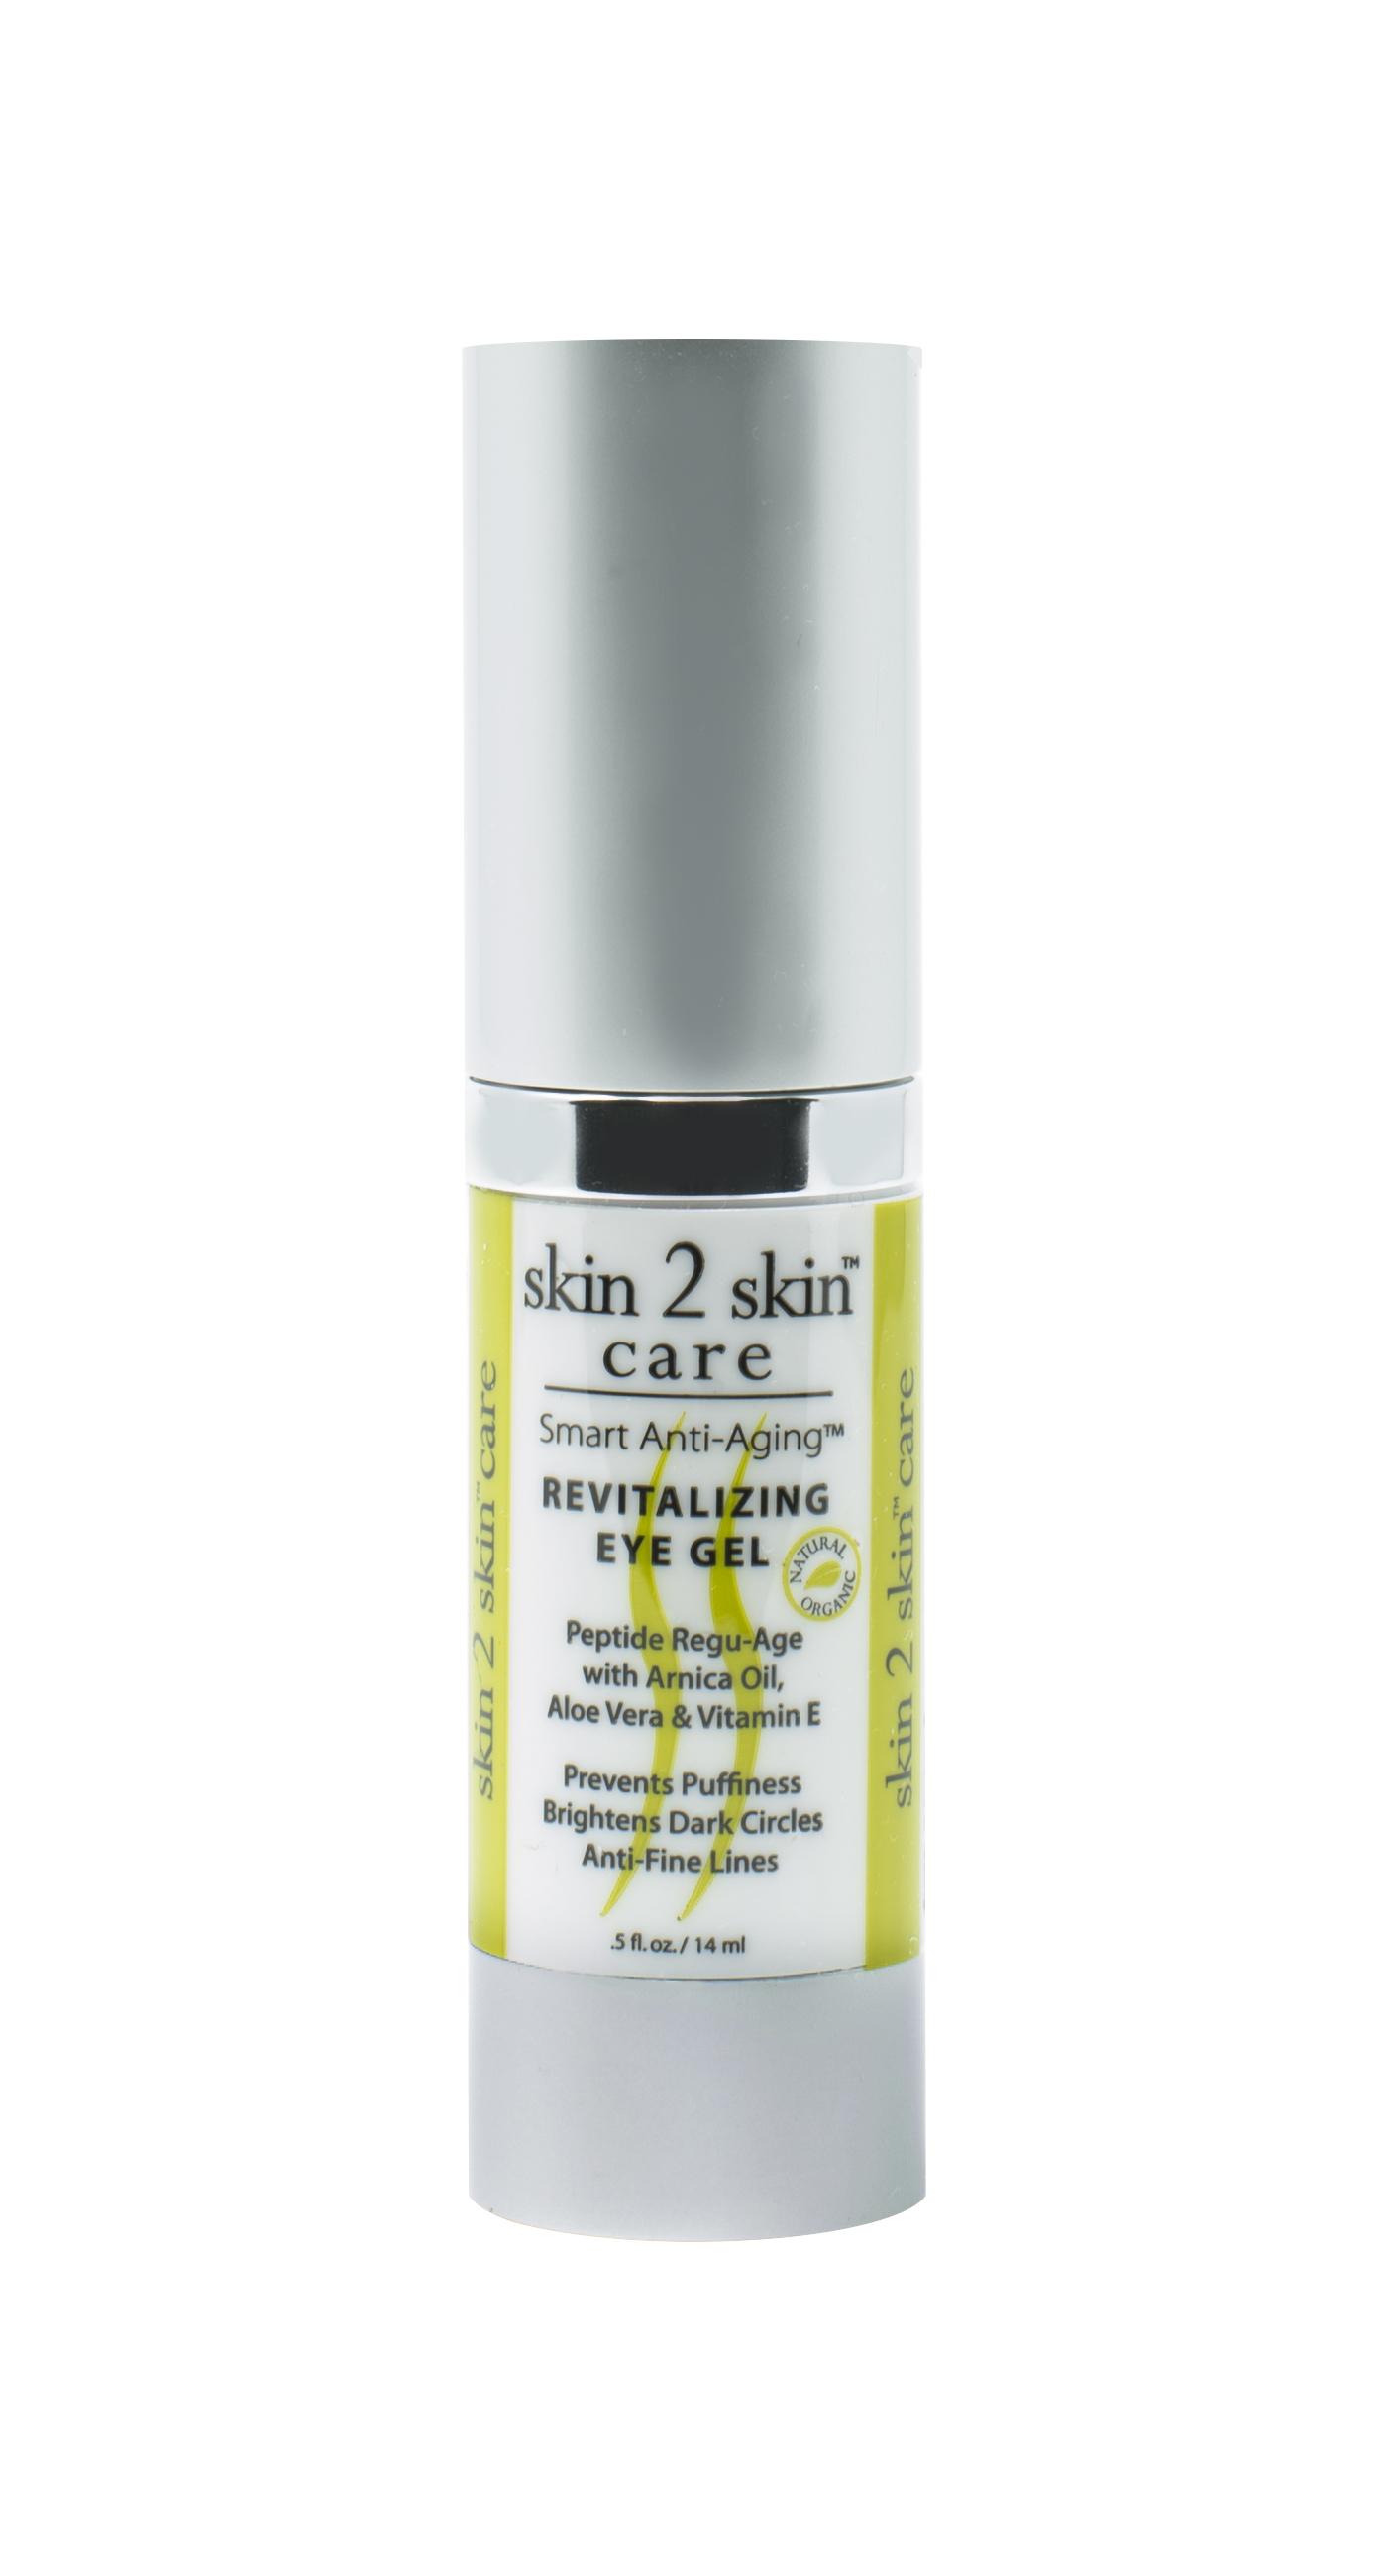 Revitalizing Eye Gel by Skin 2 Skin.jpg